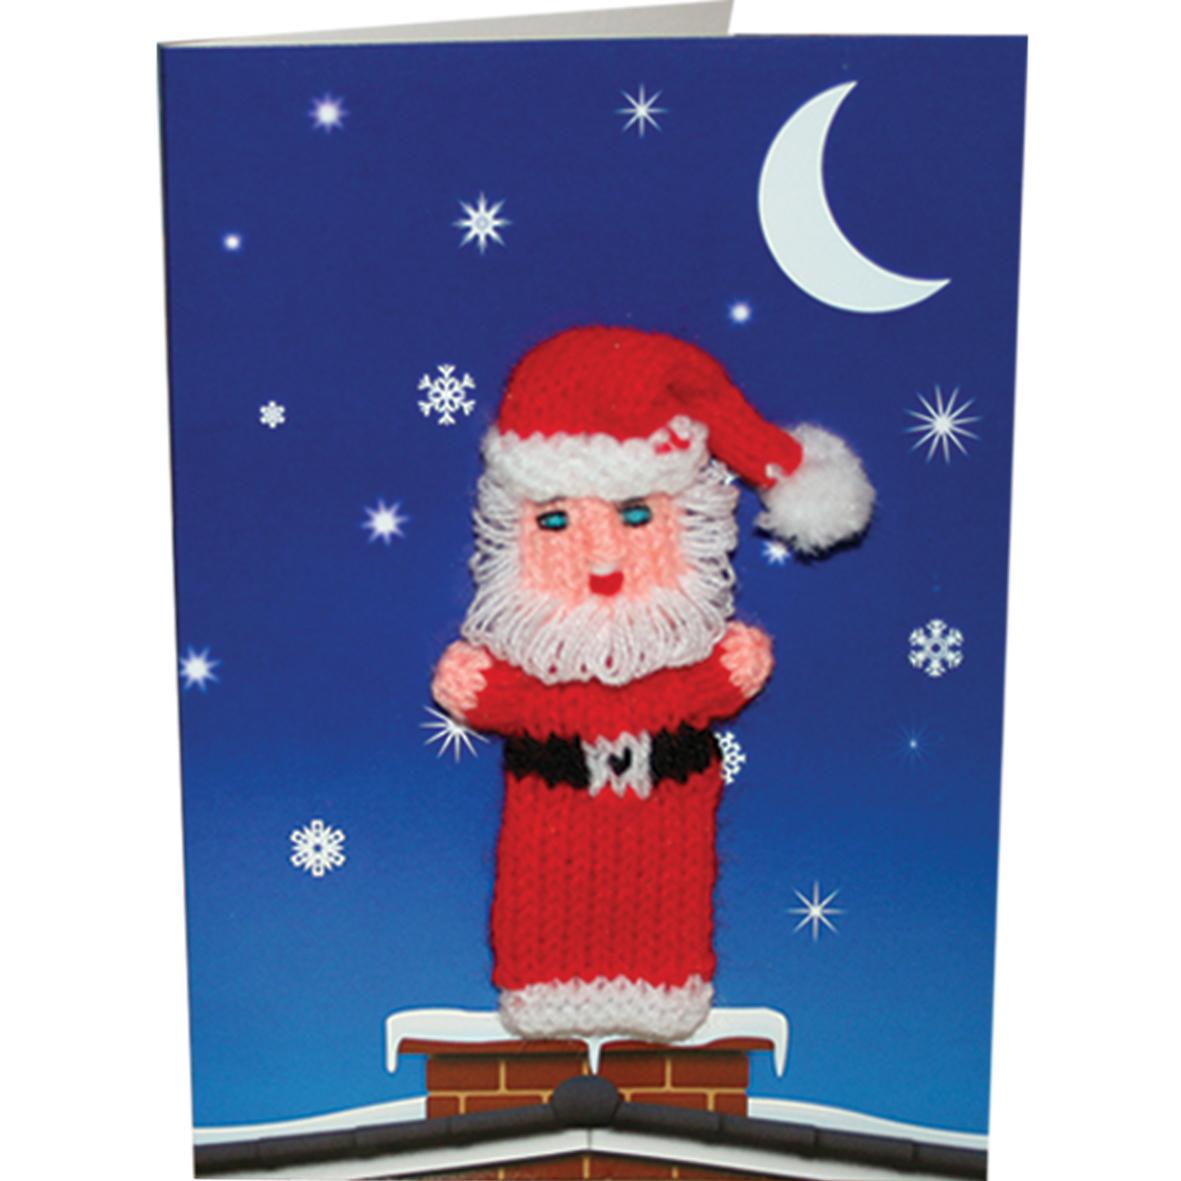 Santa On Chimney Finger Puppet Greeting Card Buy Finger Puppets At